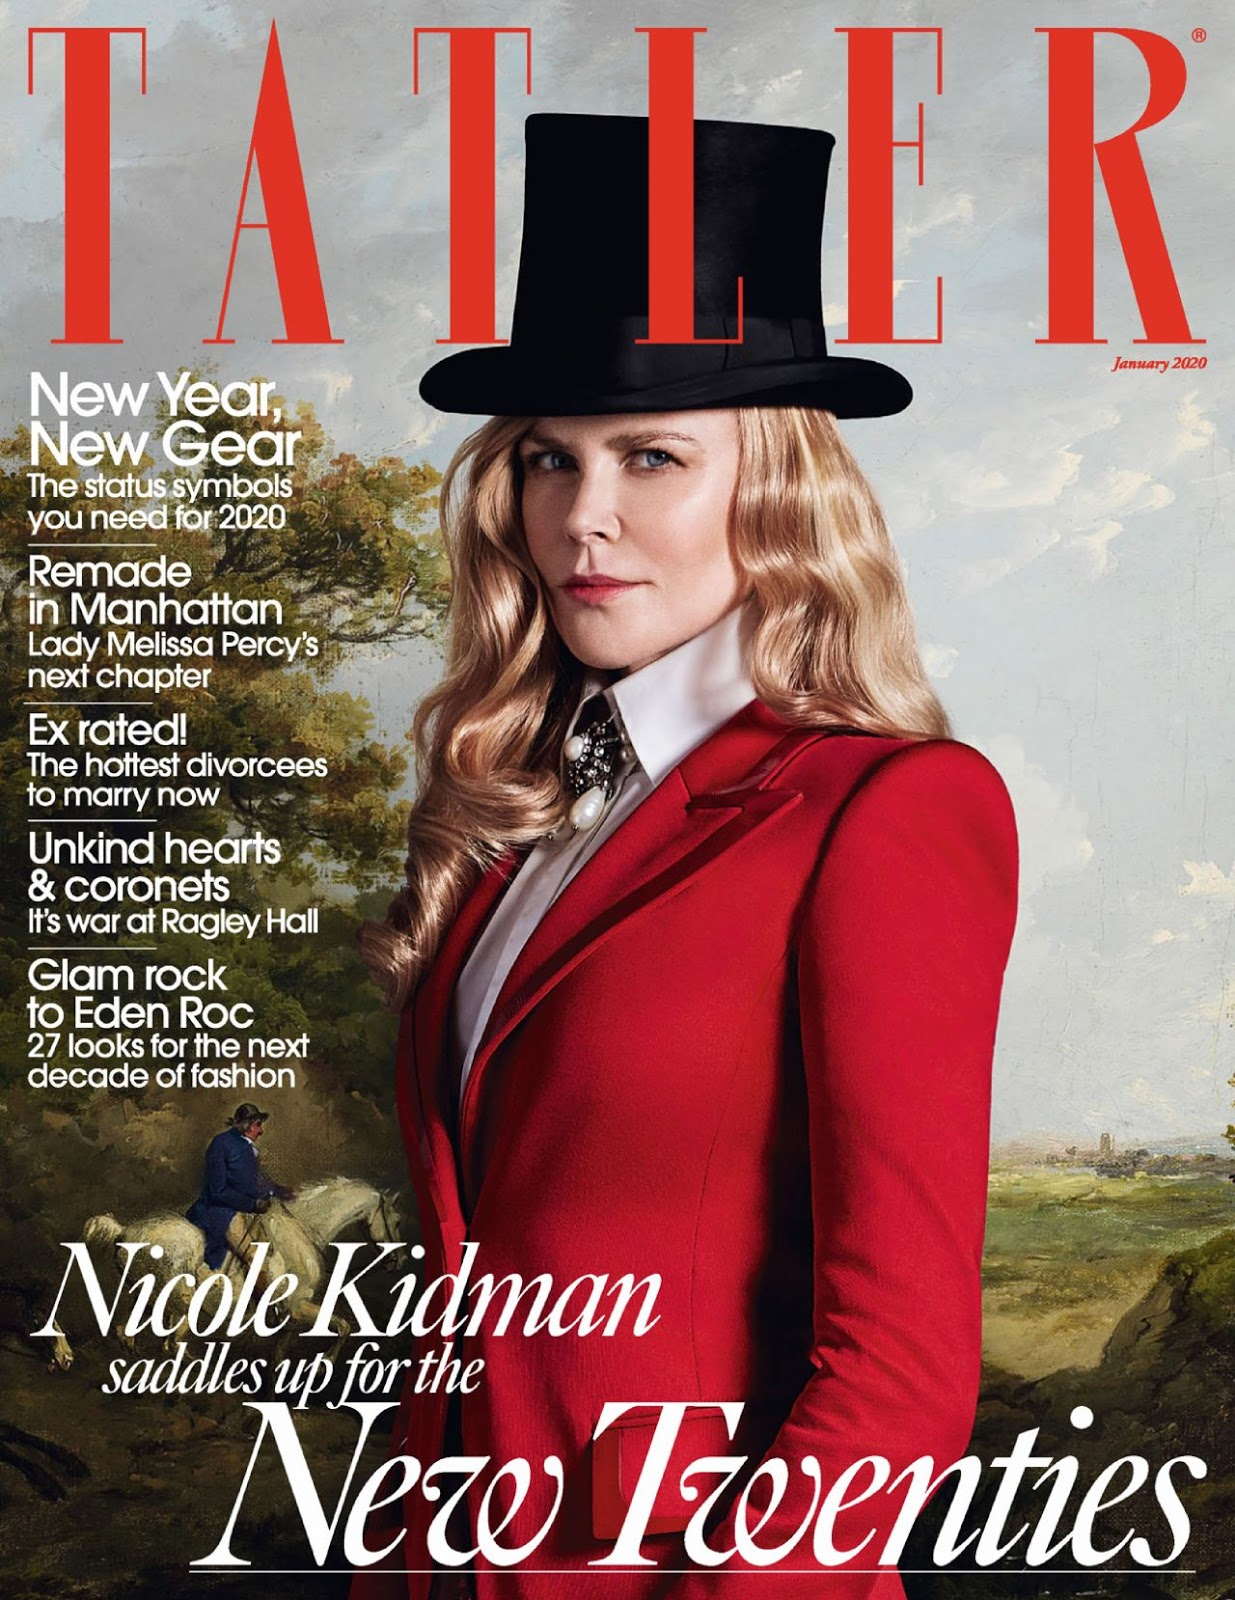 Nicole Kidman steps into 2020 with a glamorous shoot for Tatler UK